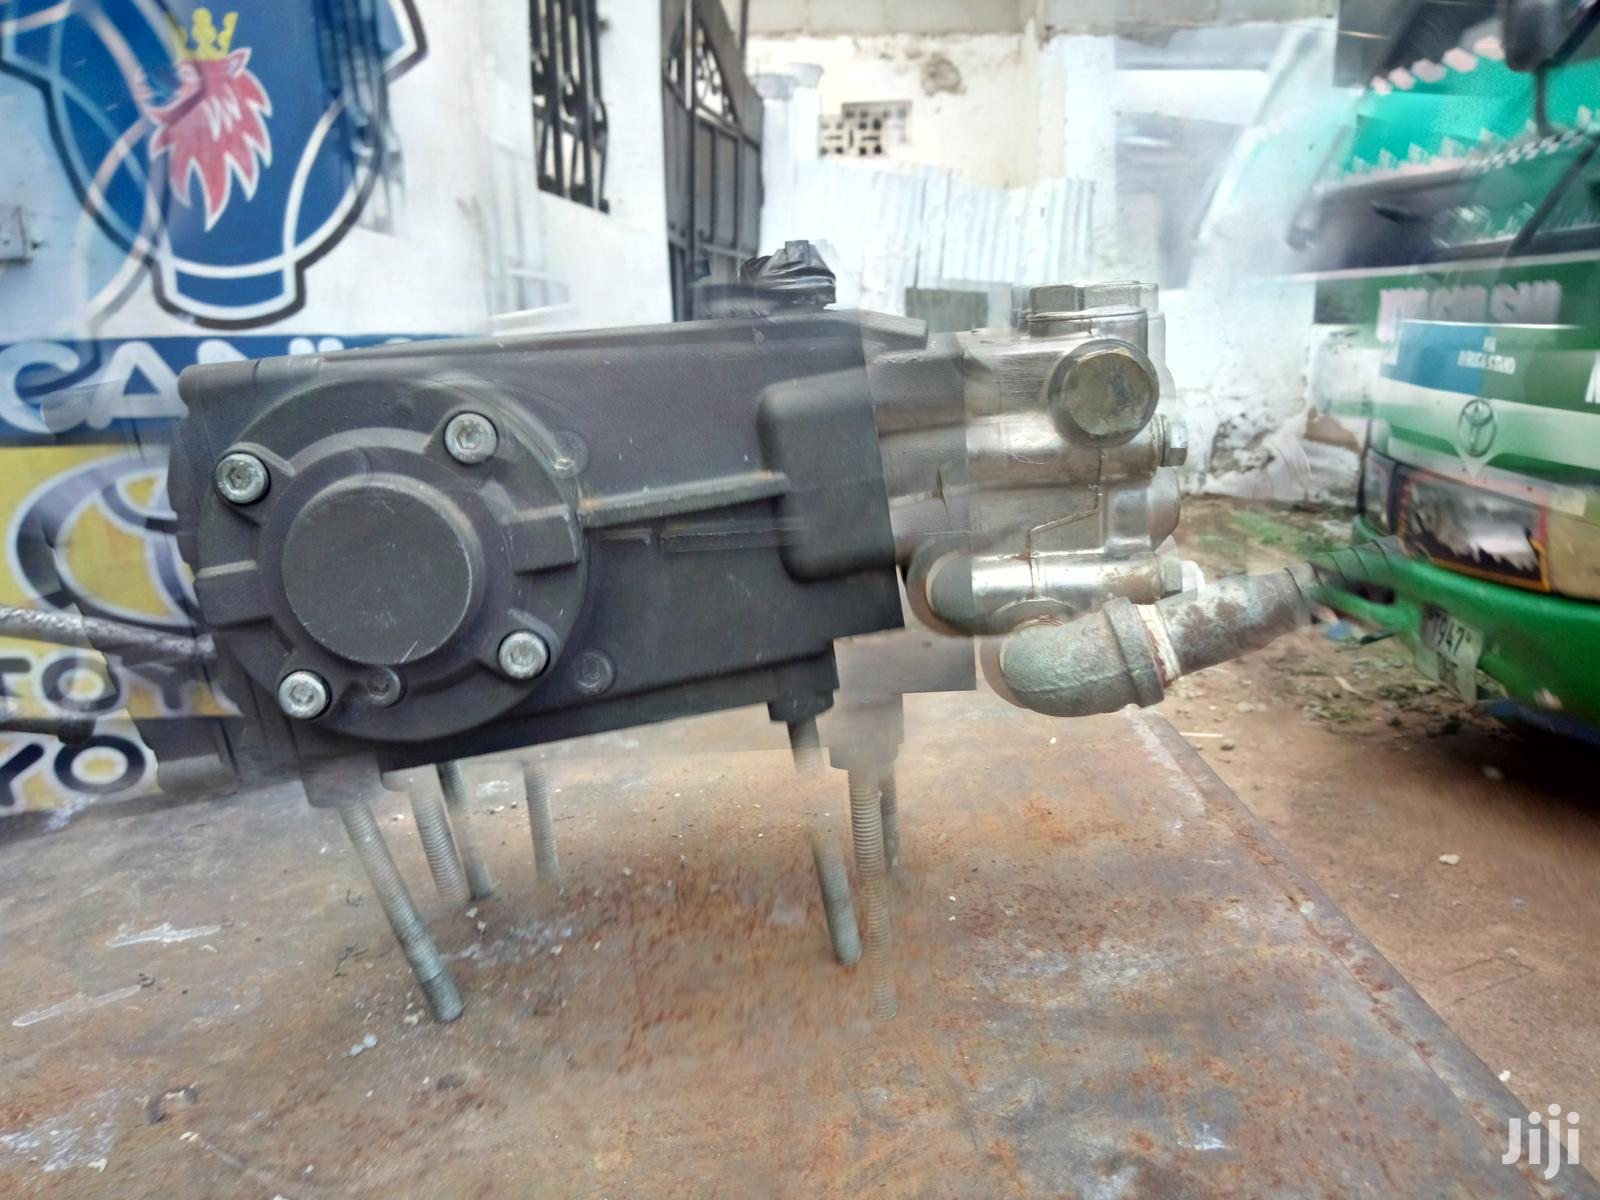 Interpump Pump WS202,(Pressure Washer)   Manufacturing Equipment for sale in Nyamagana, Mwanza Region, Tanzania